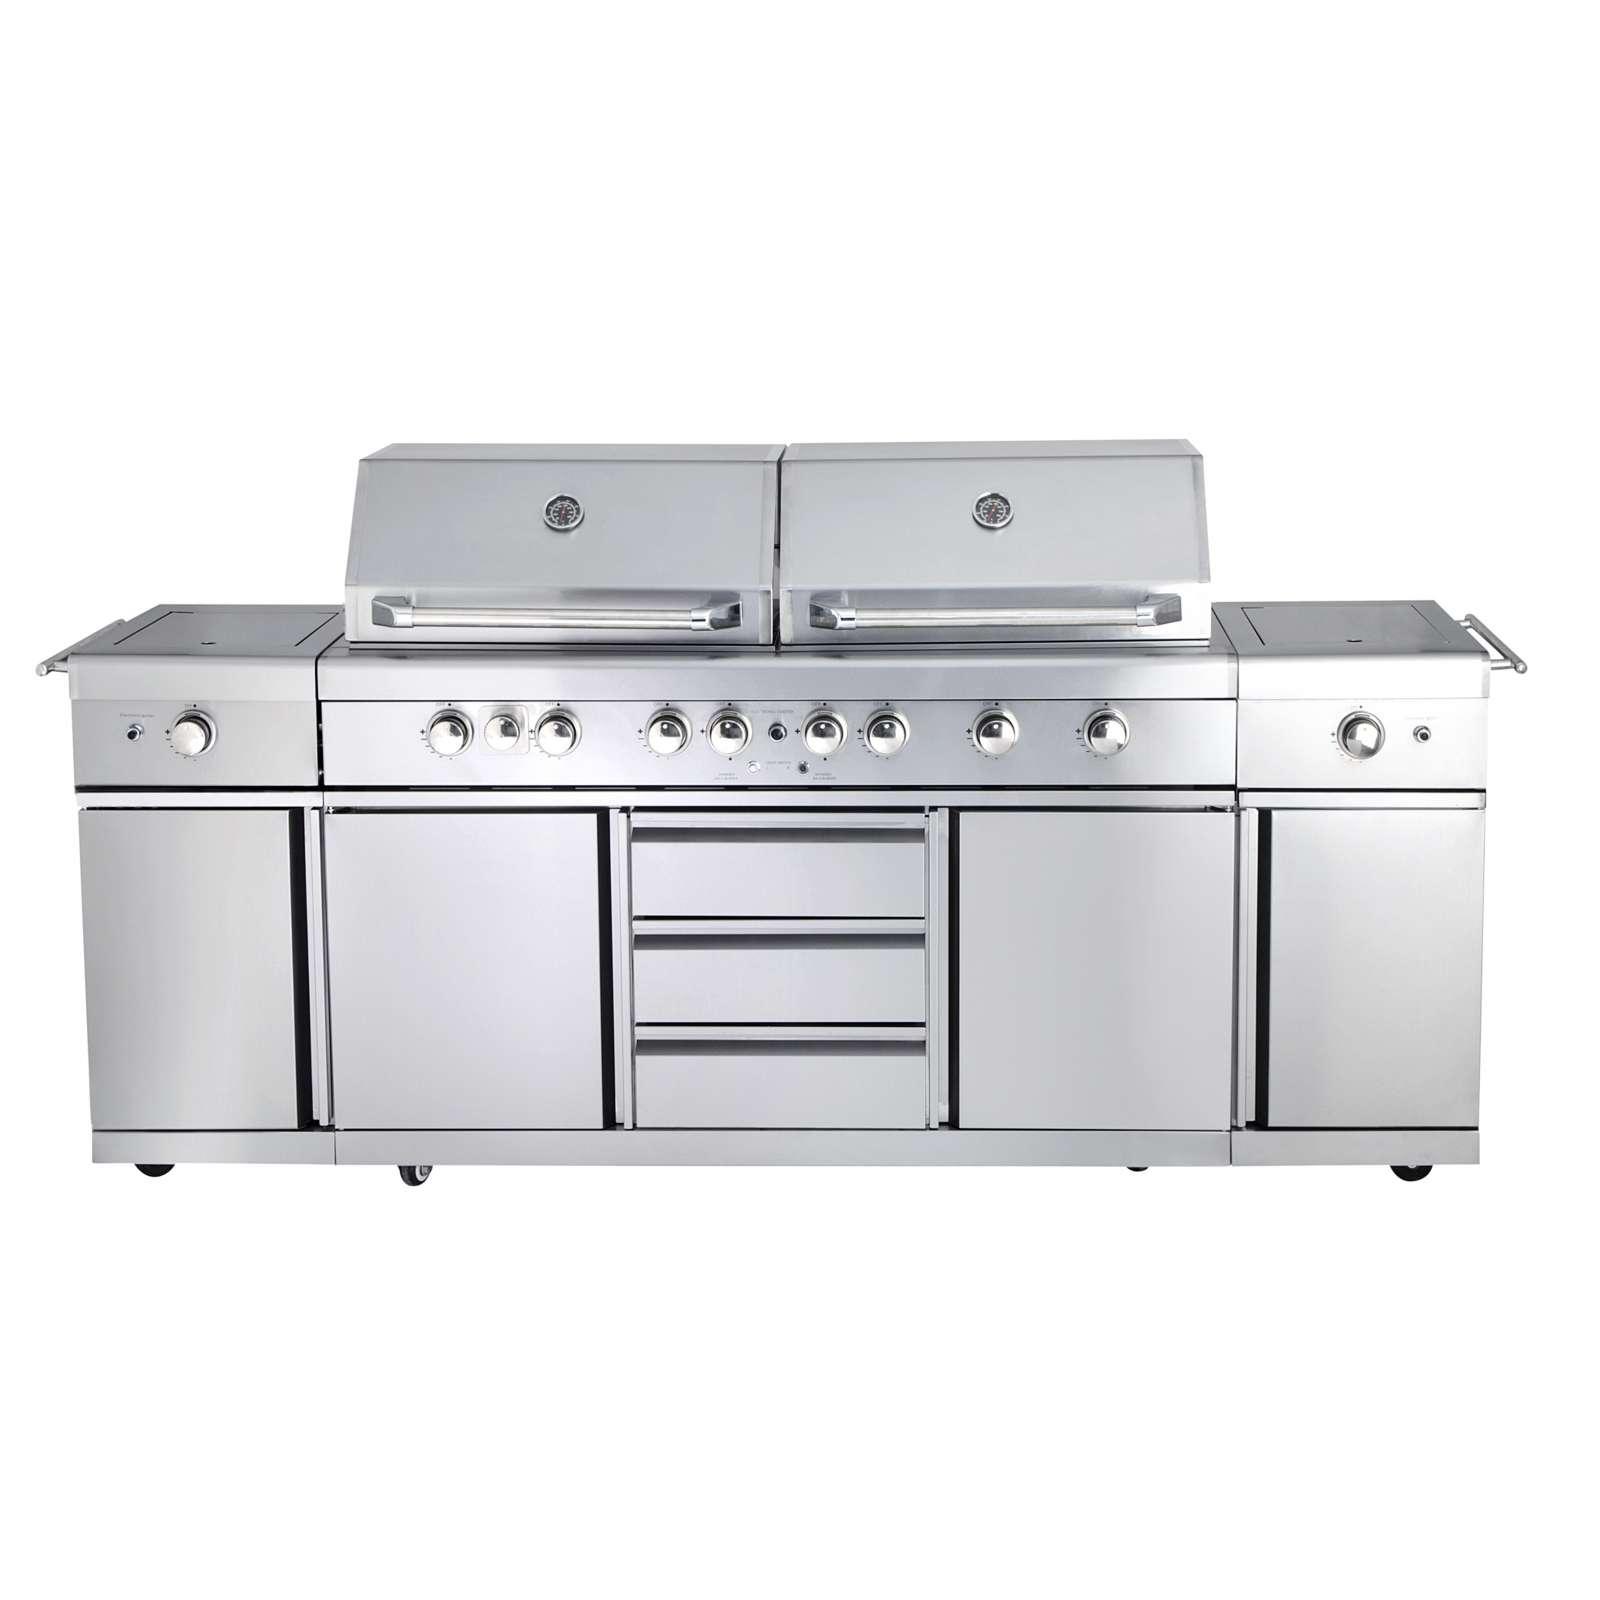 Allgrill Top-Line Extrem Gasgrill Volledelstahl Outdoor Küche